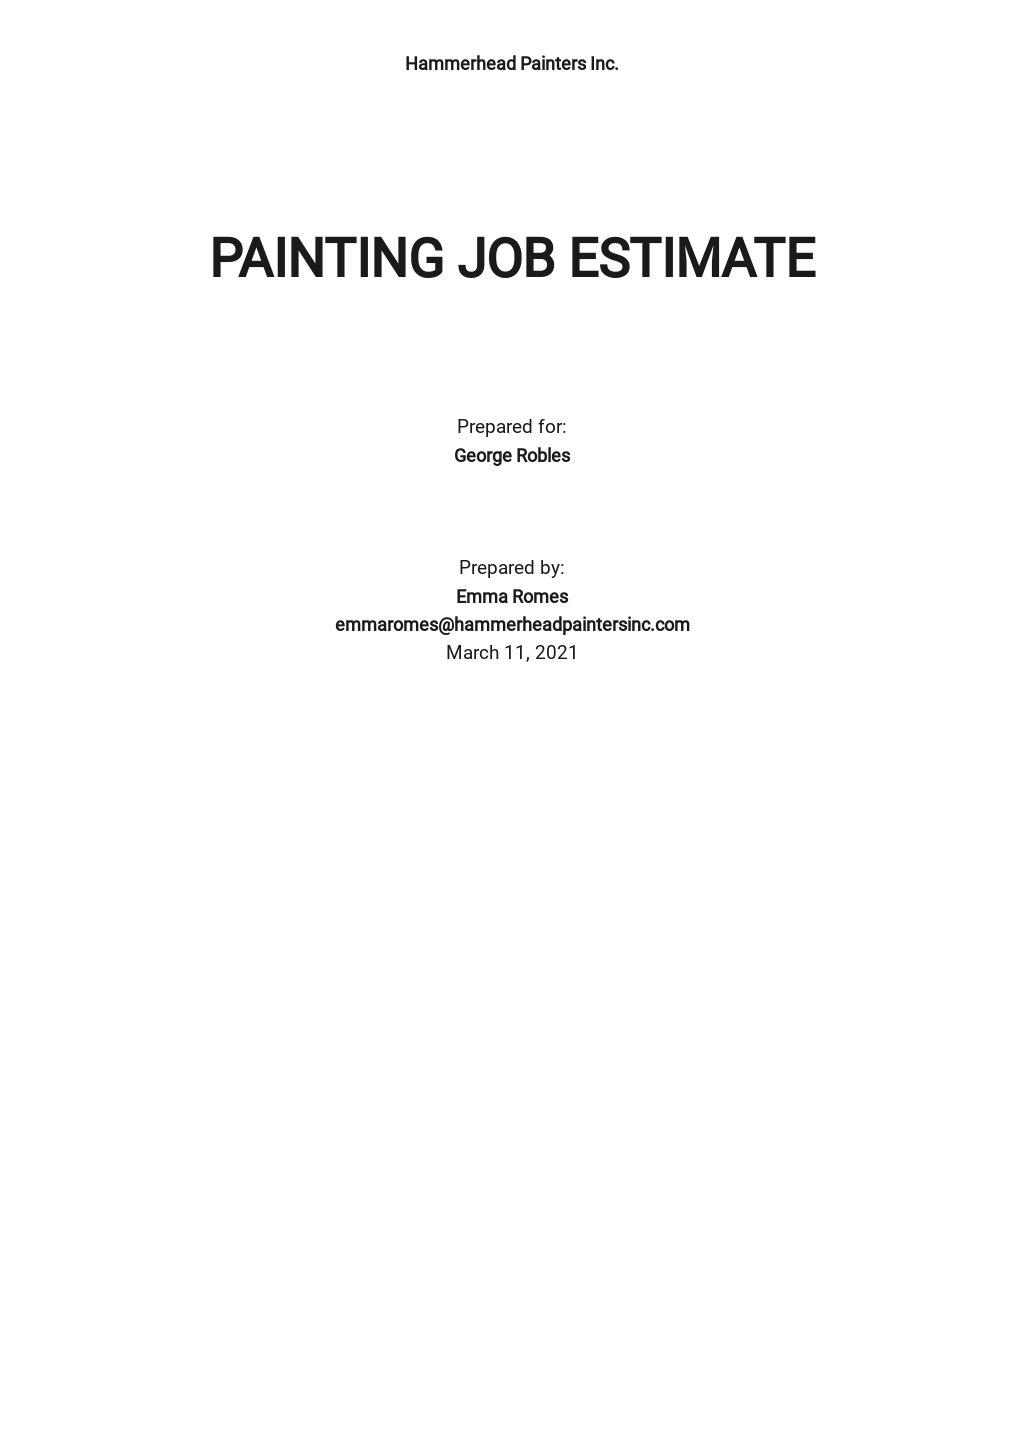 Painting Estimate Template.jpe